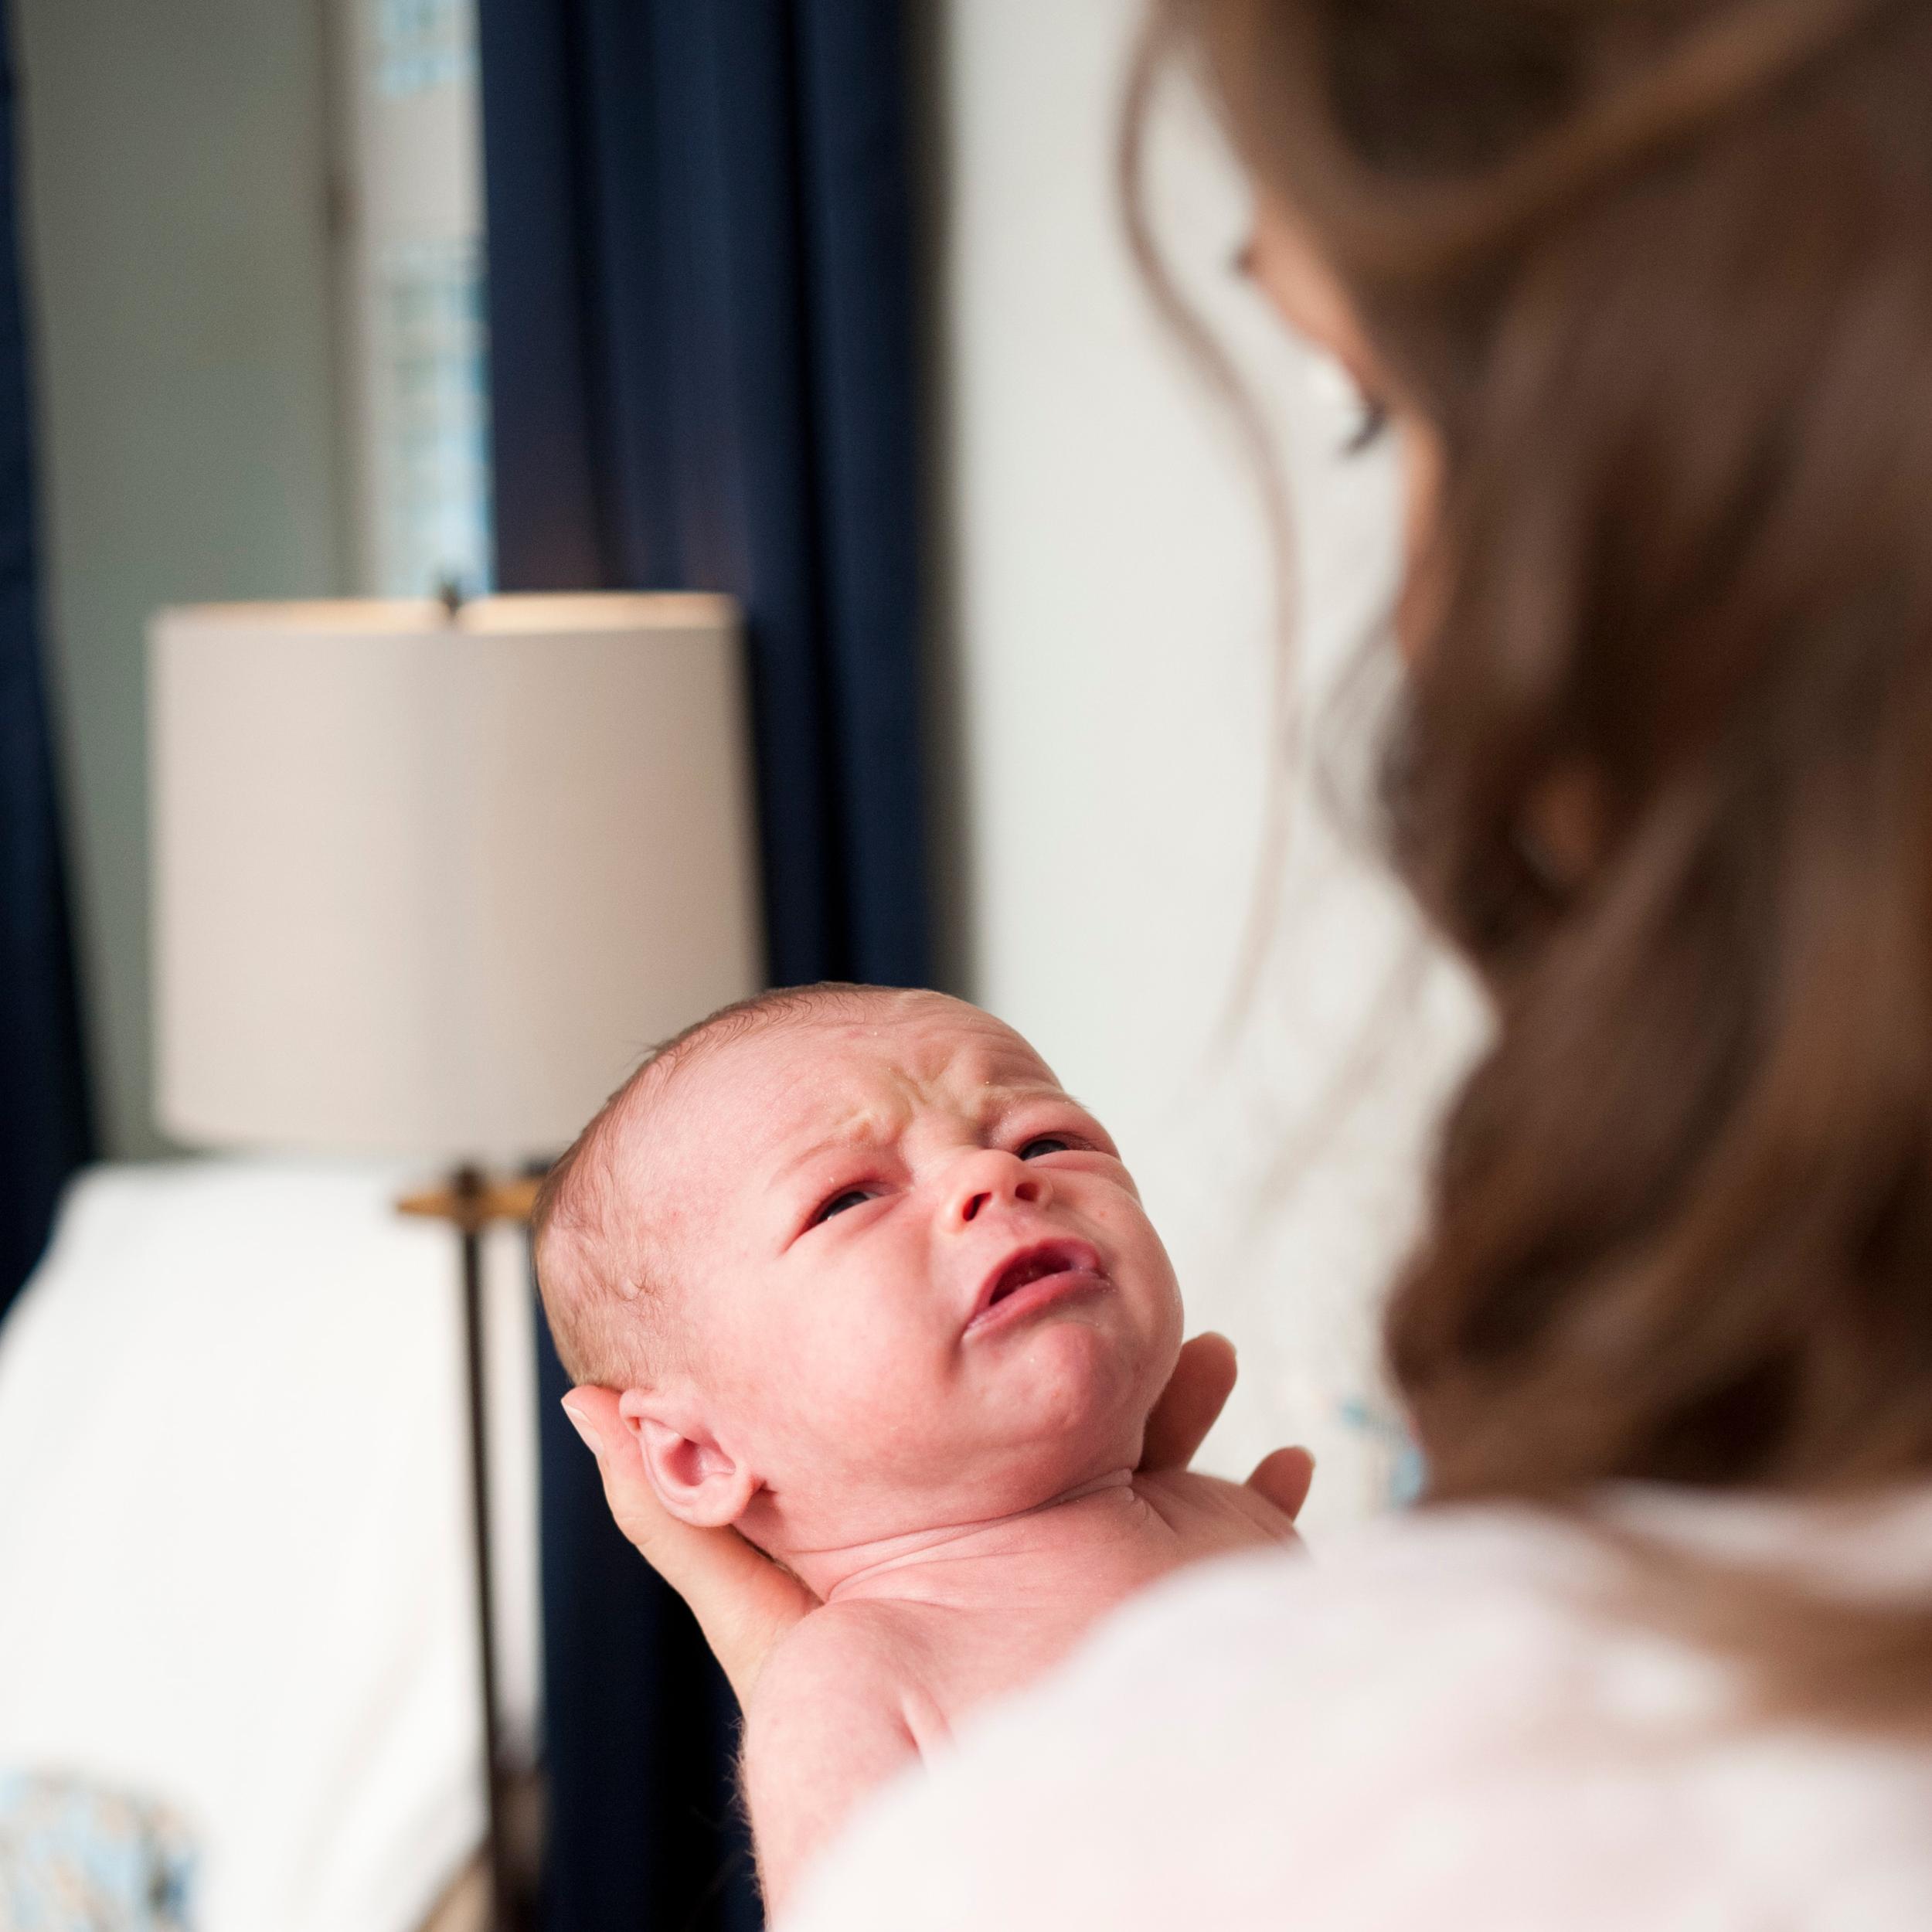 motherhood, newborn photography, first baby